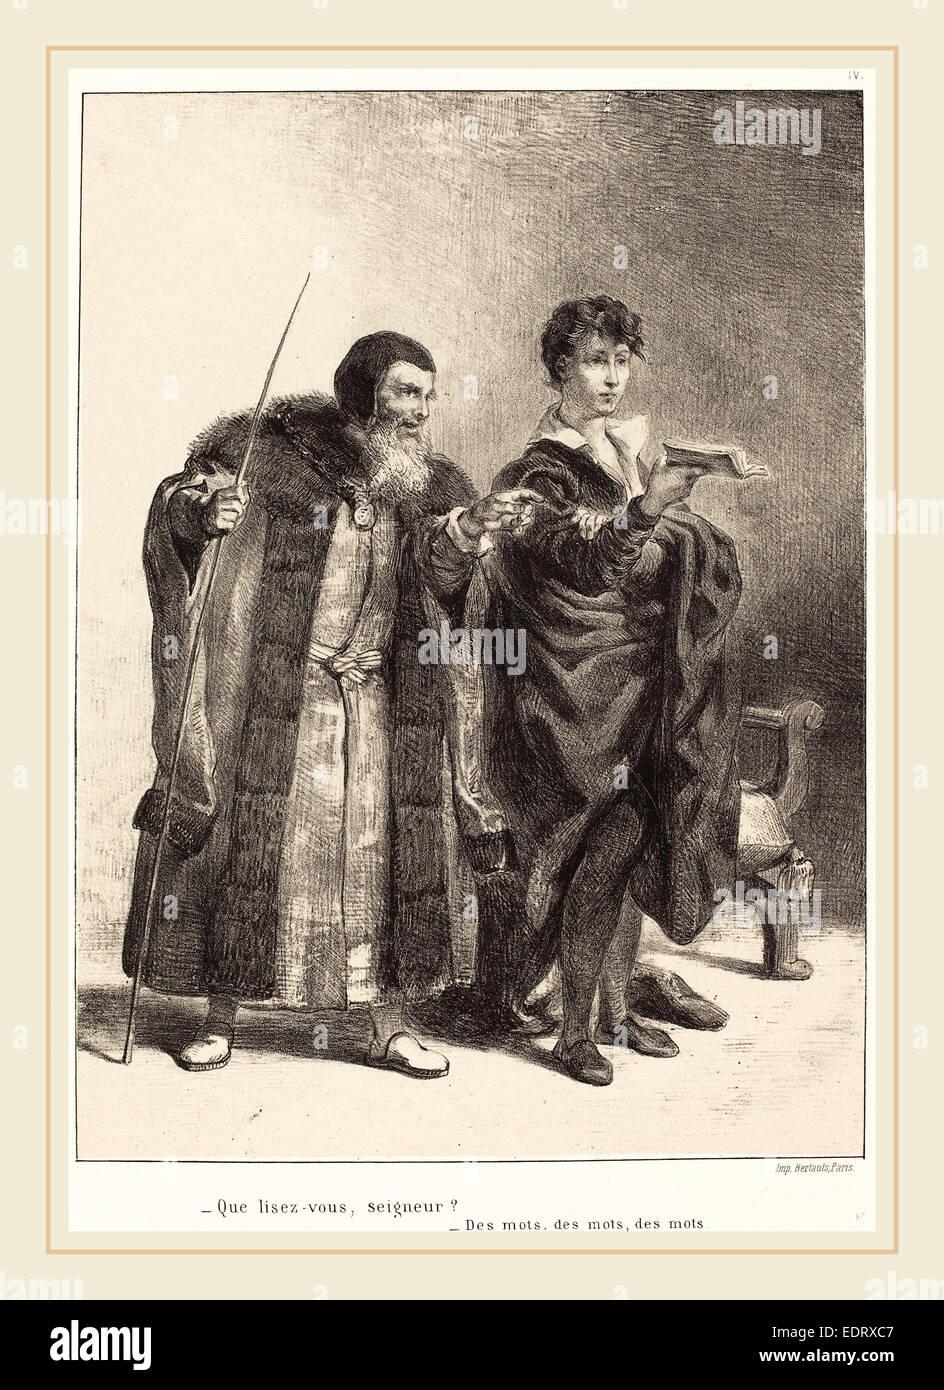 Eugène Delacroix (French, 1798-1863), Polonius and Hamlet (Act II, Scene II), 1834-1843, lithograph - Stock Image